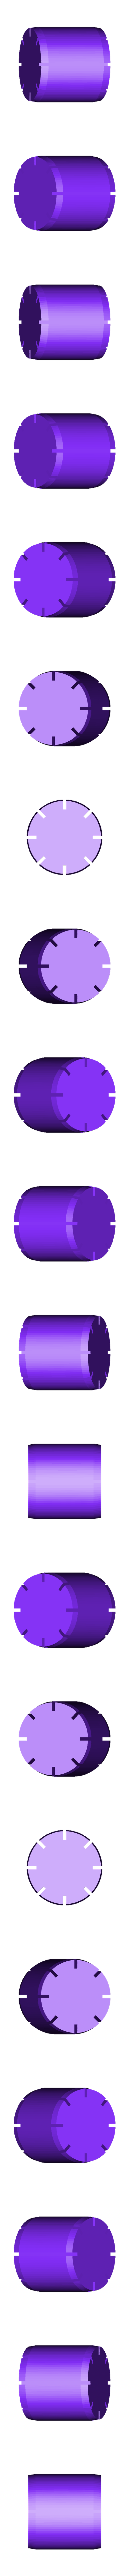 Main_Body_Connector.stl Download free STL file Flyer Mk. 1 • 3D printing object, billbo1958